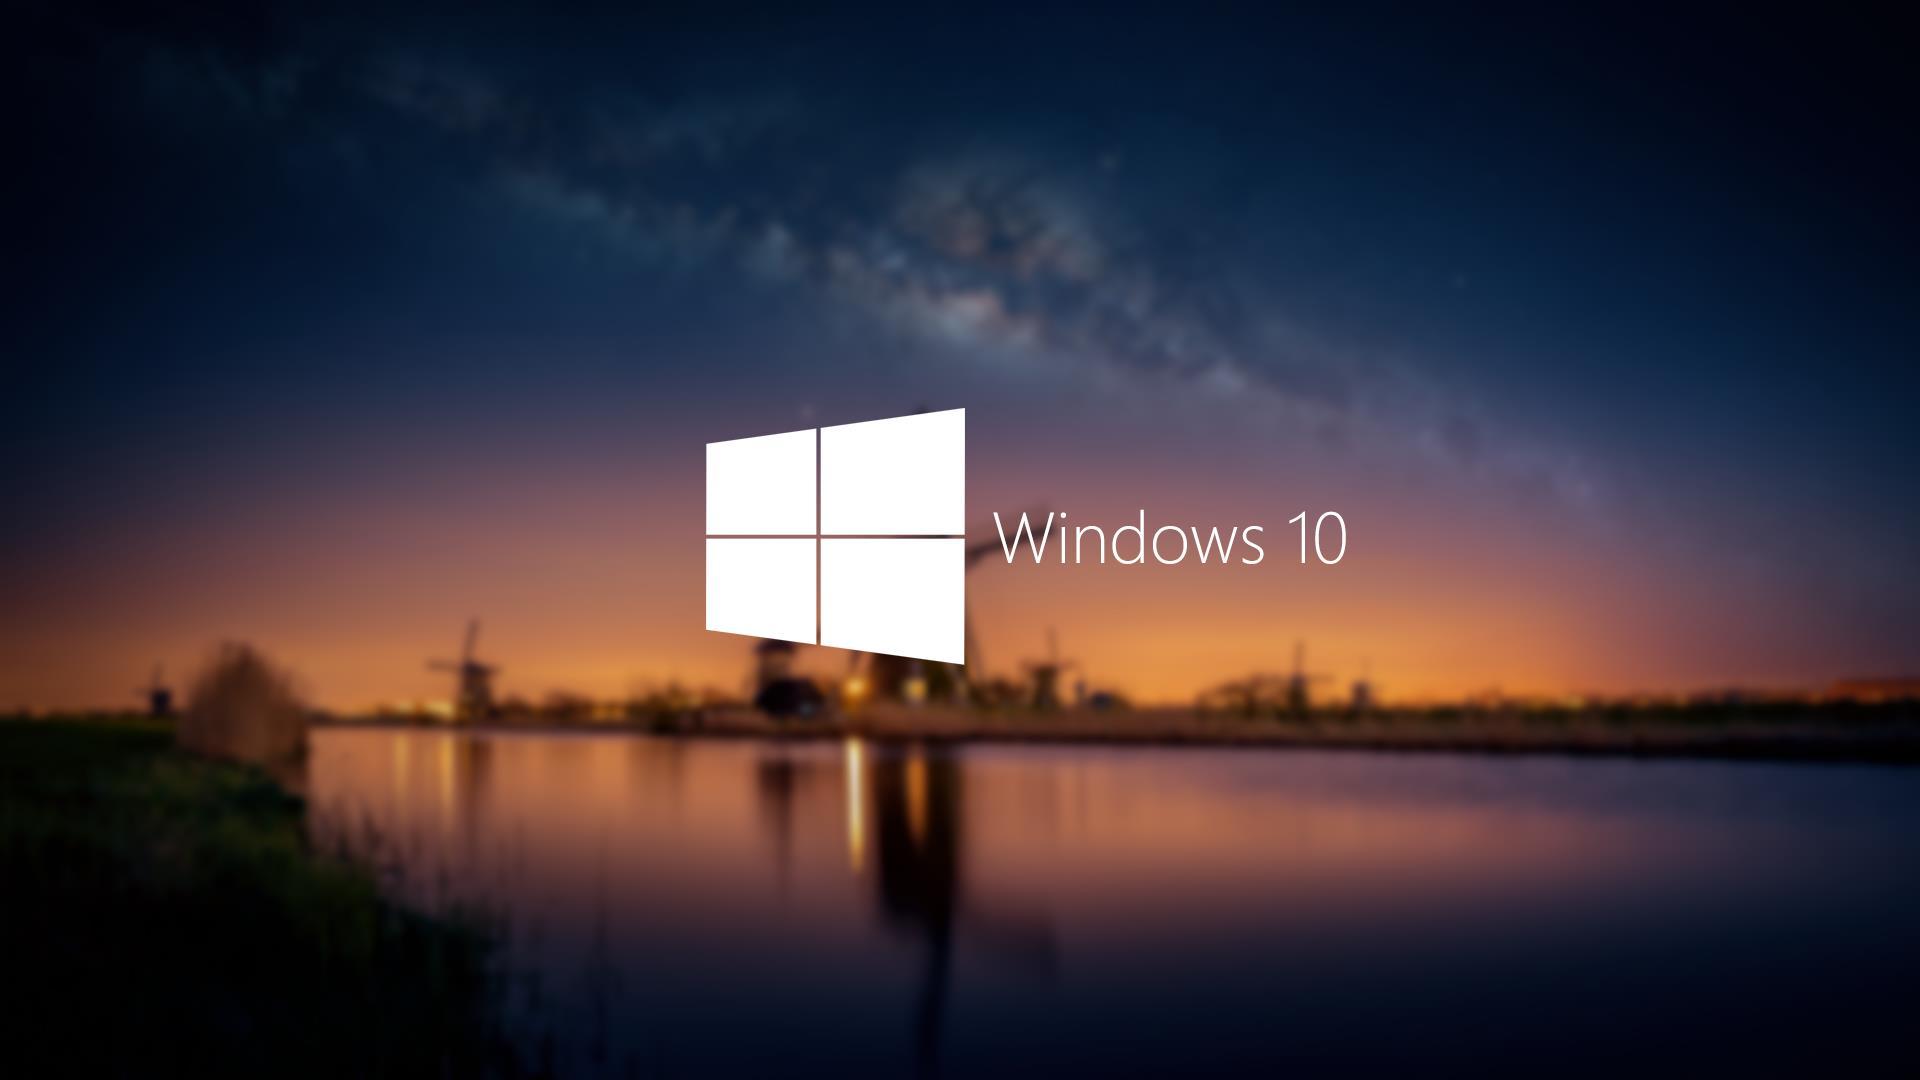 Windows 10 Wallpaper Hd 1366x768 Supportive Guru